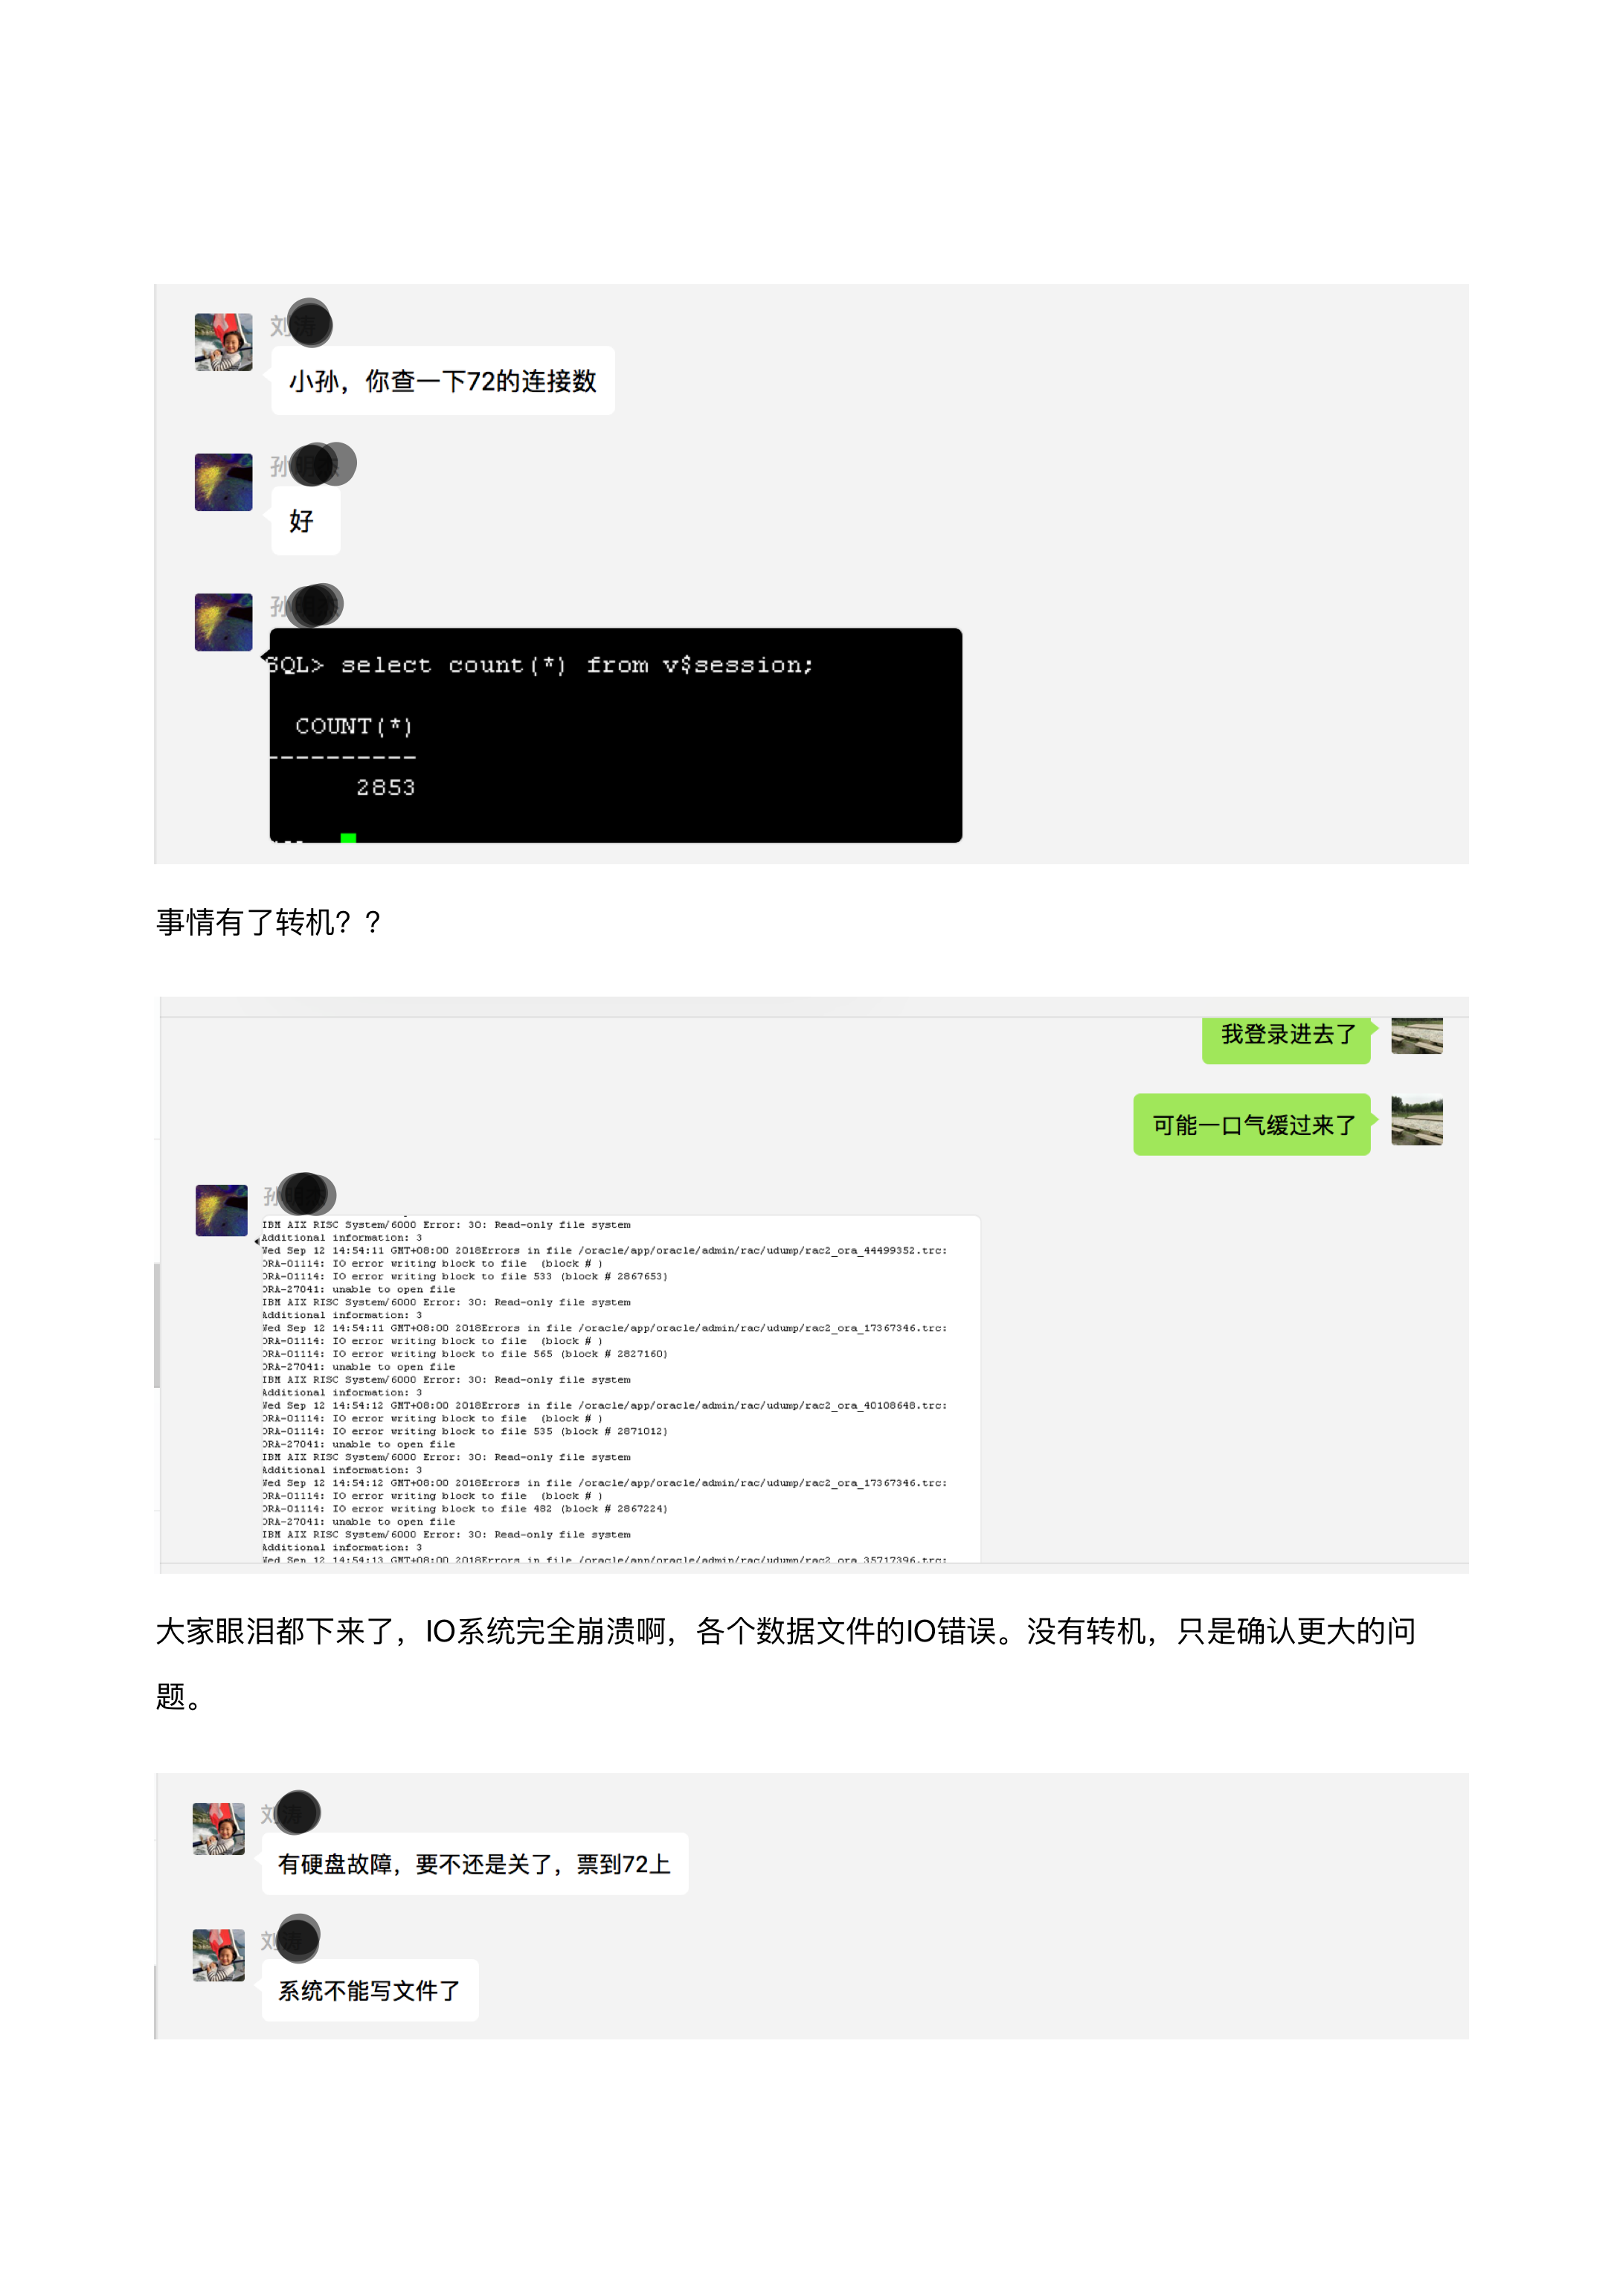 66d12deb2 保险核心系统运维惊魂记– 北京星图伟业信息技术有限公司